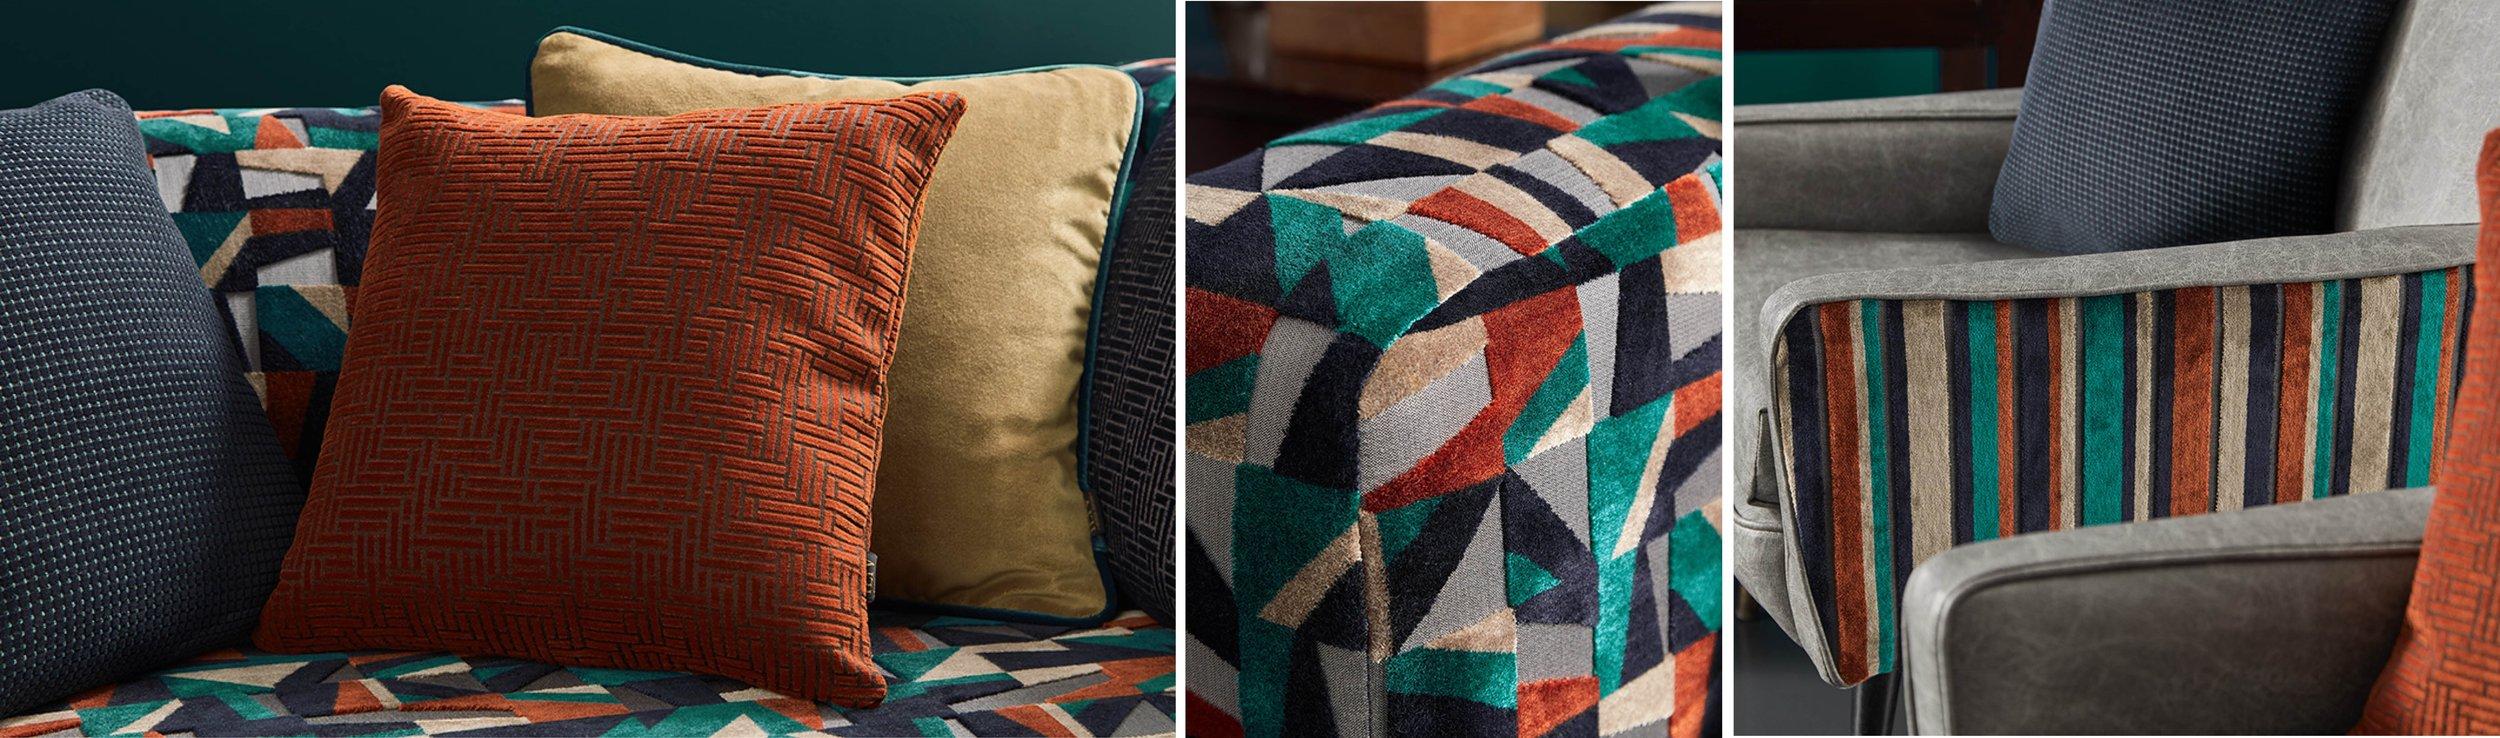 ILIV Interior Textiles - Astro